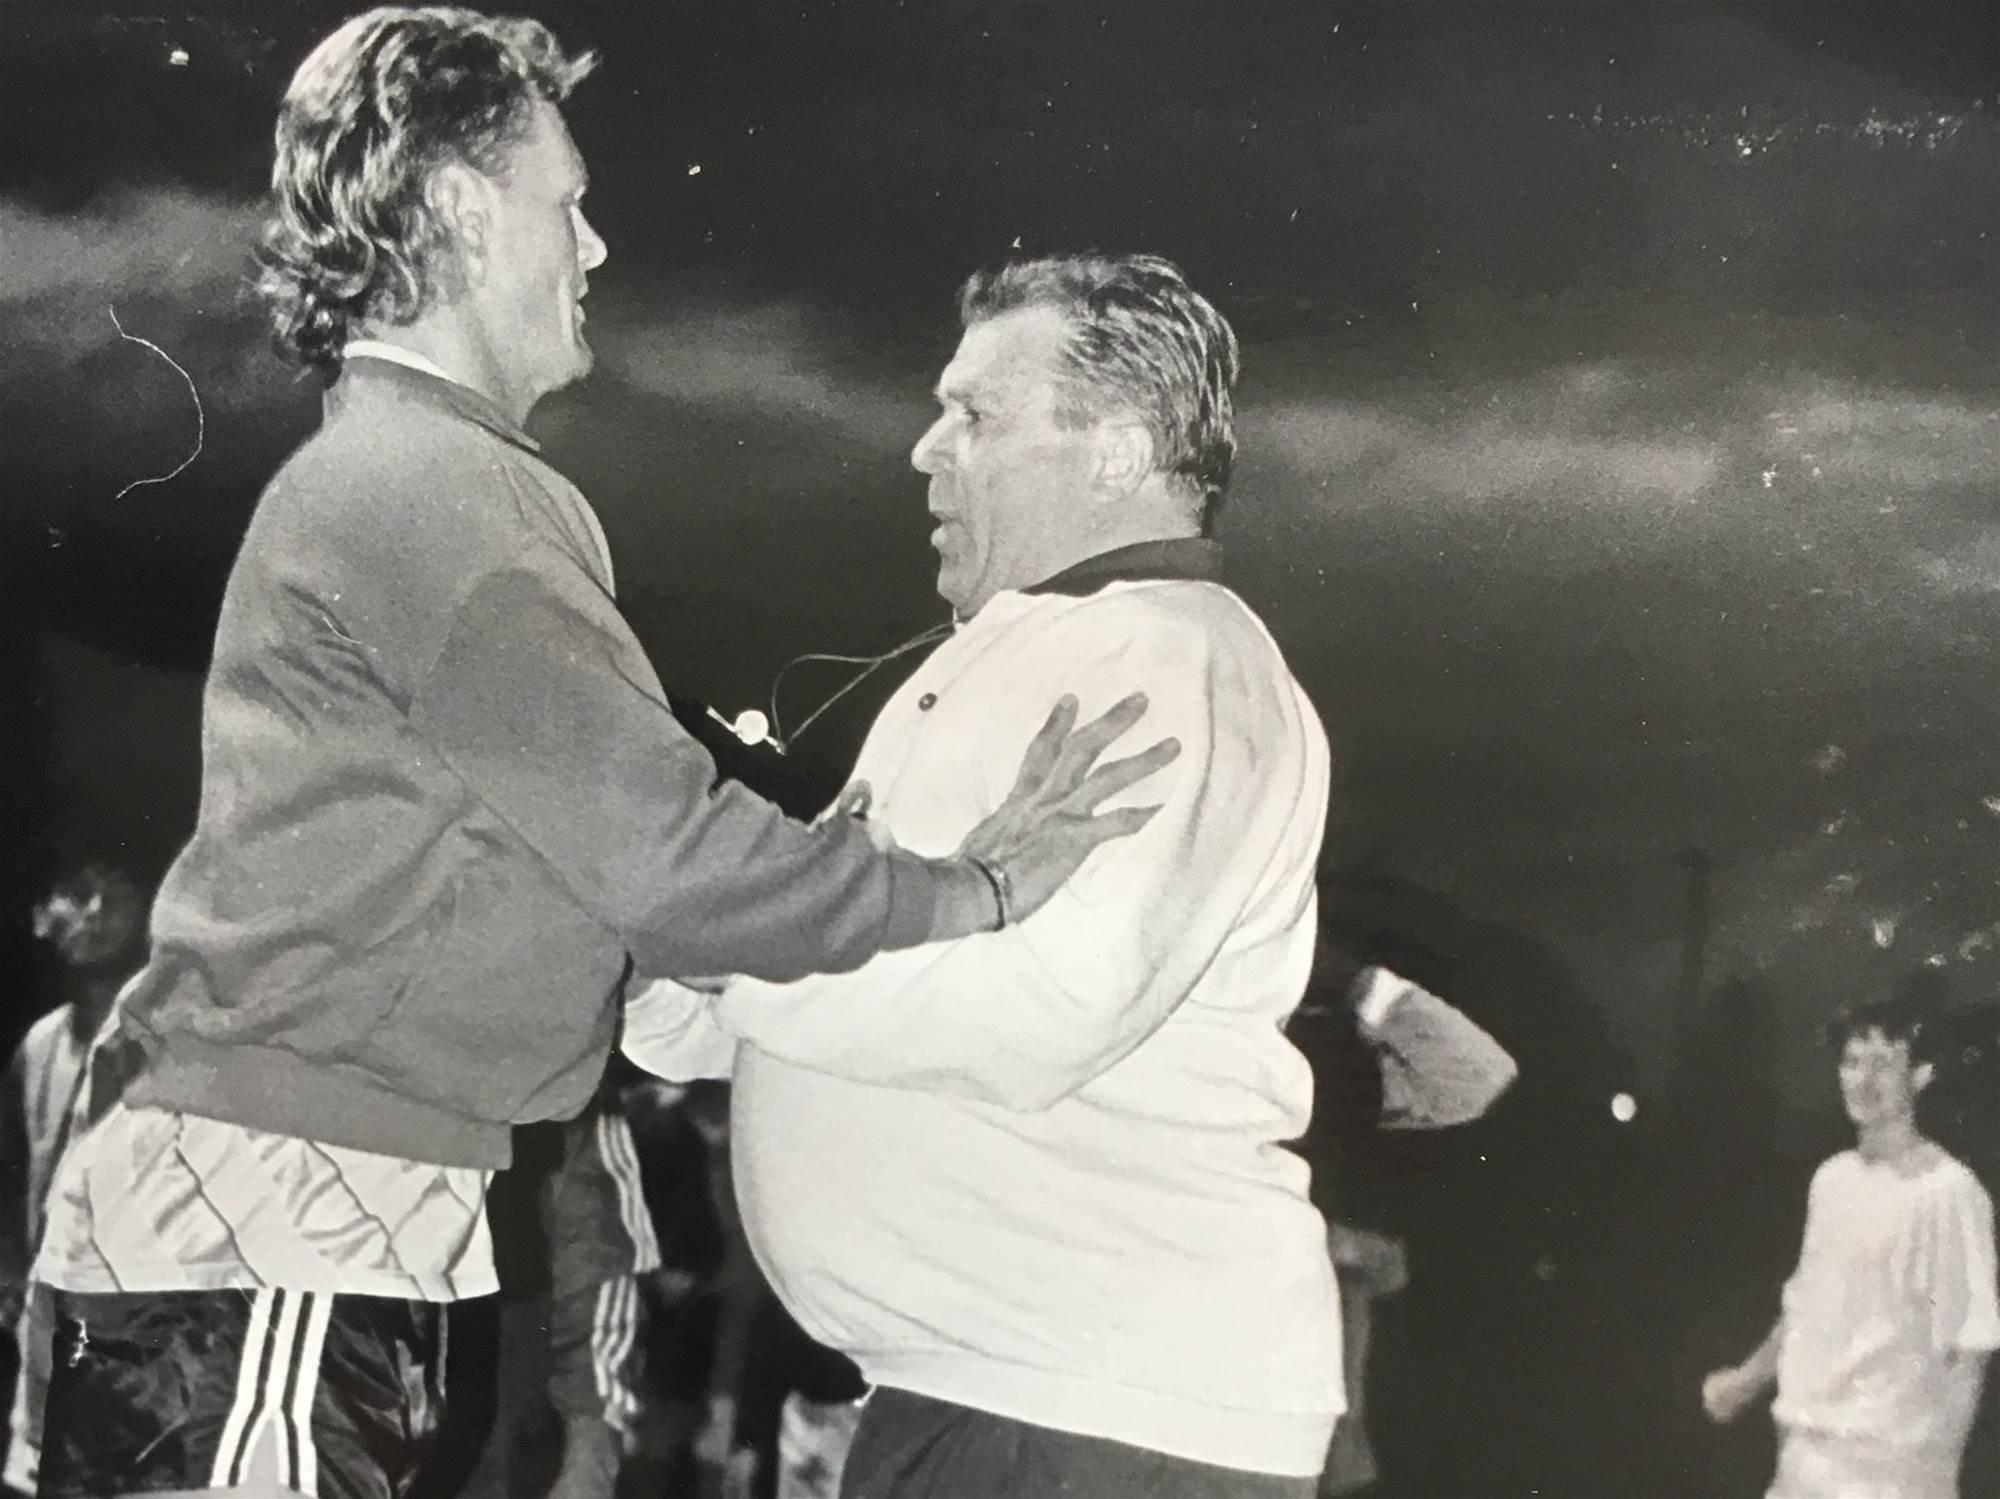 How did Puskas coach South Melbourne?